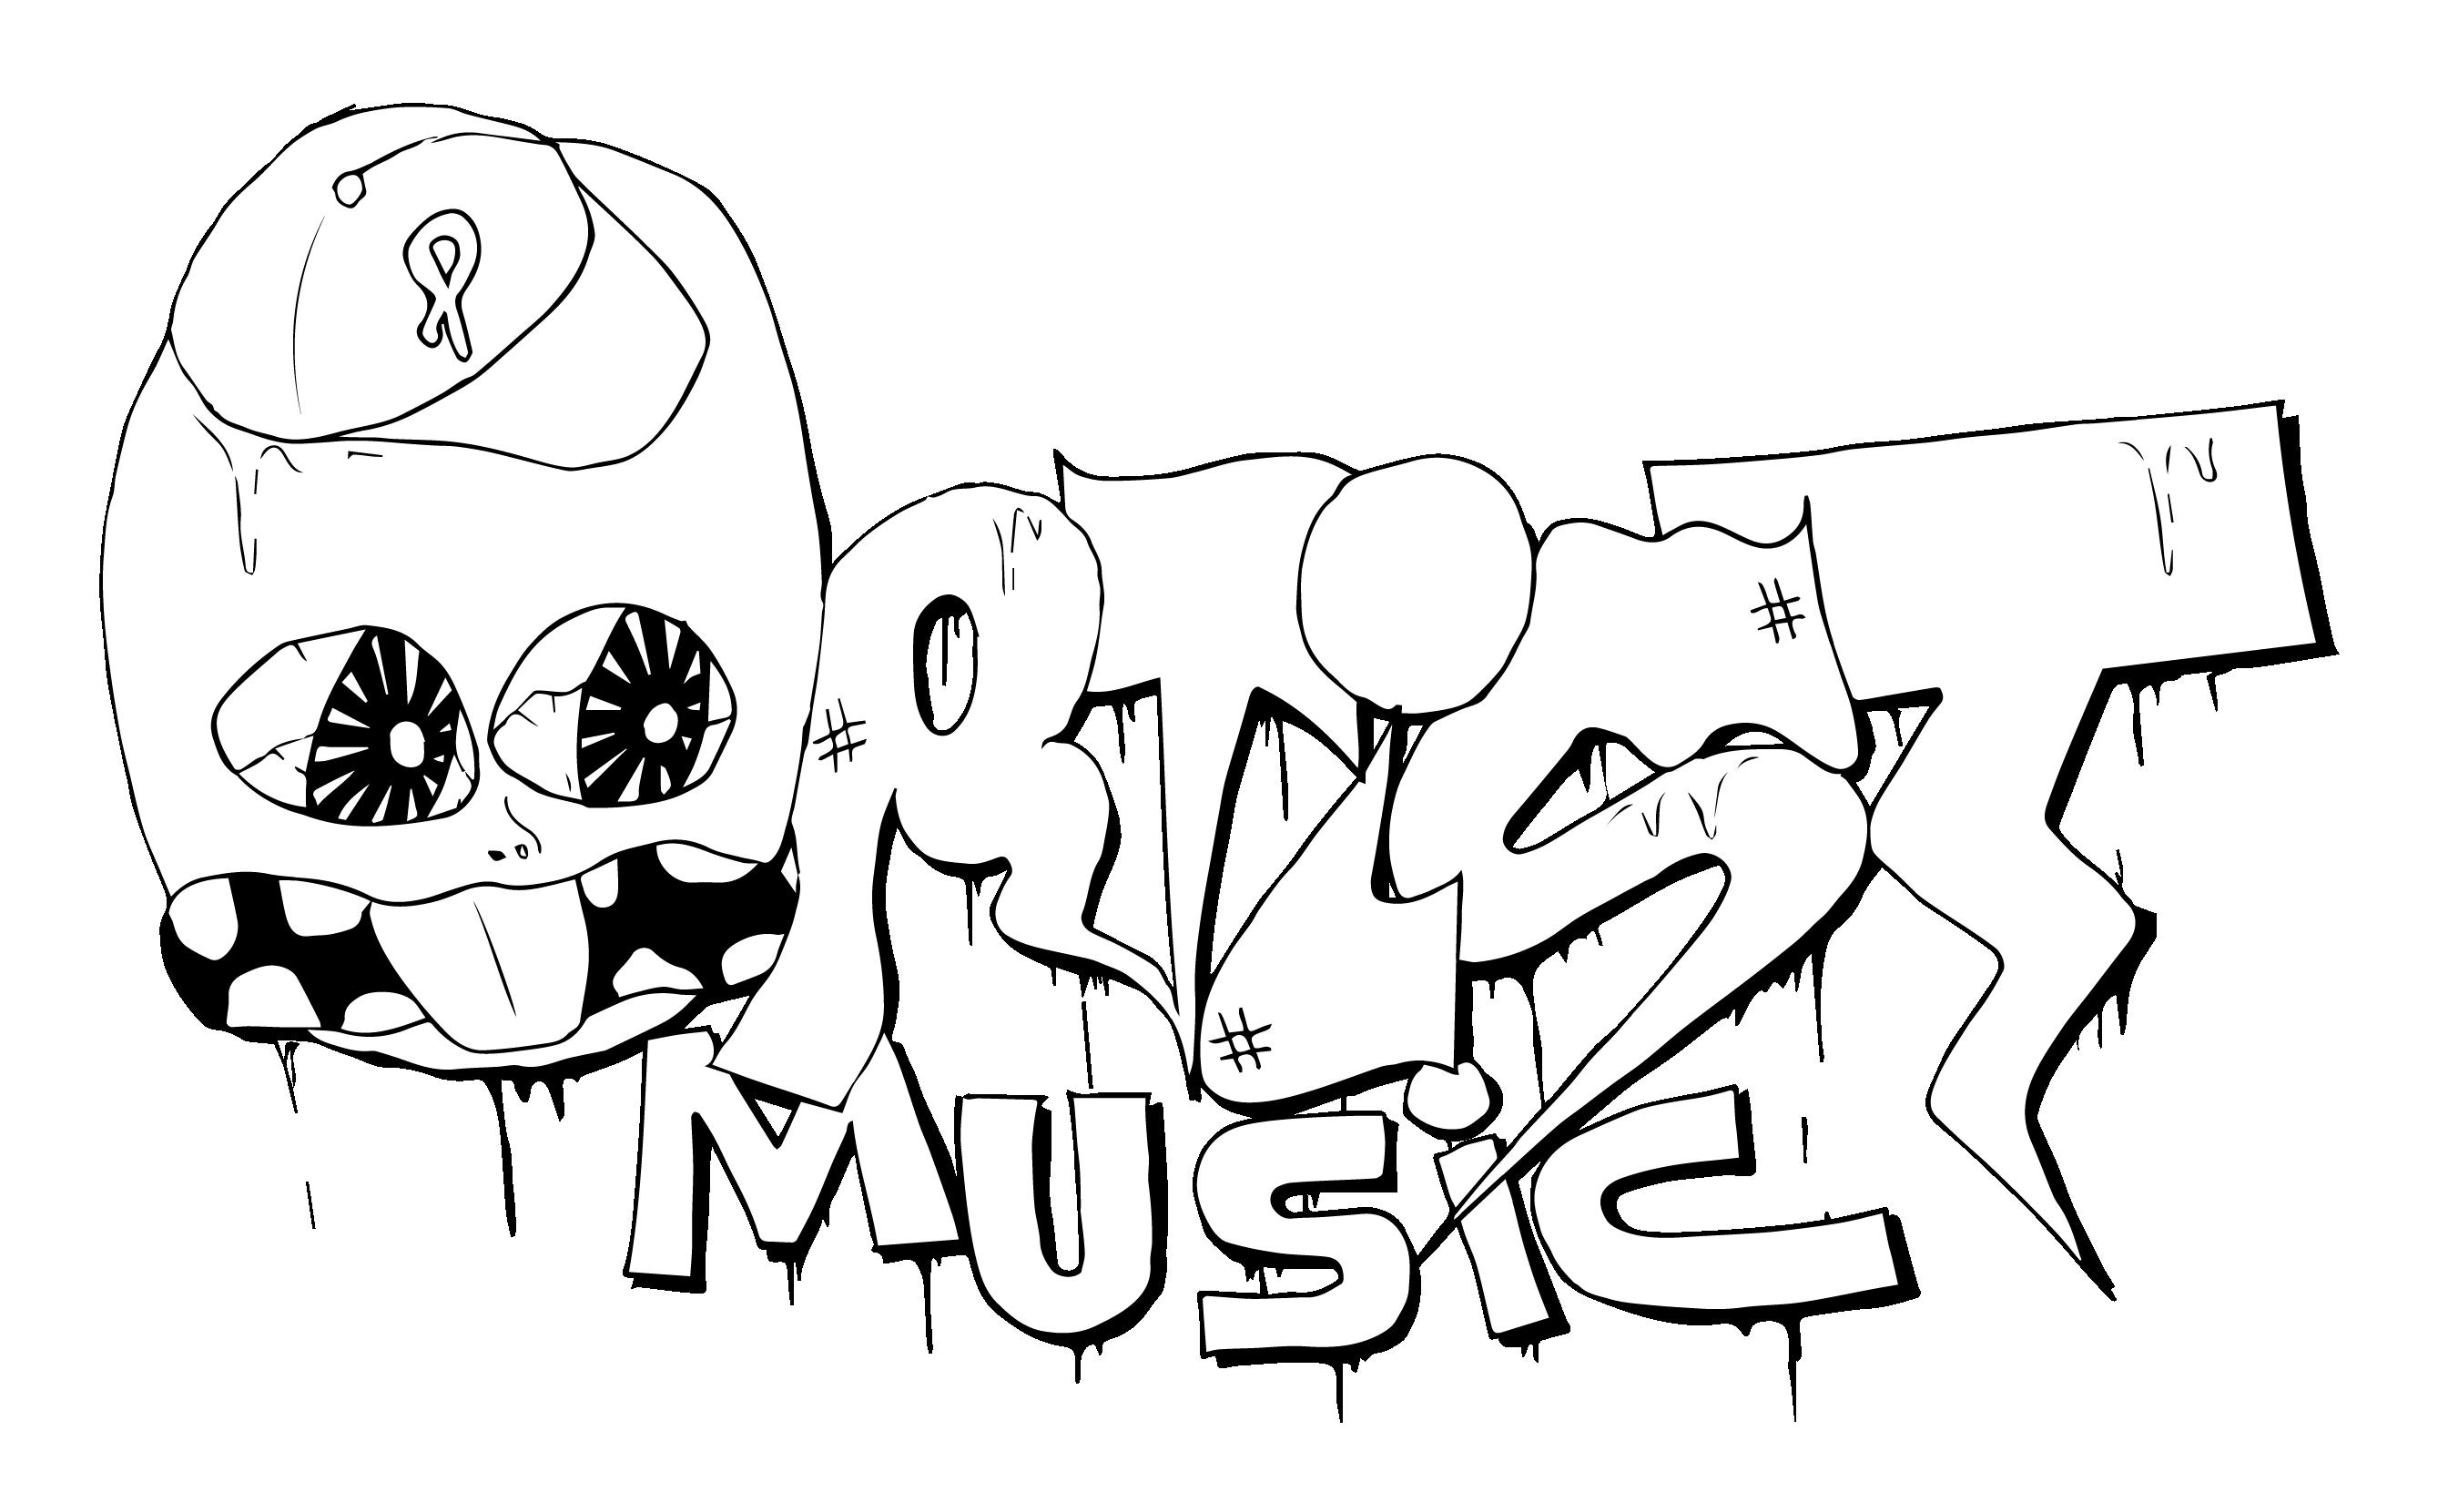 ortistmusic.com